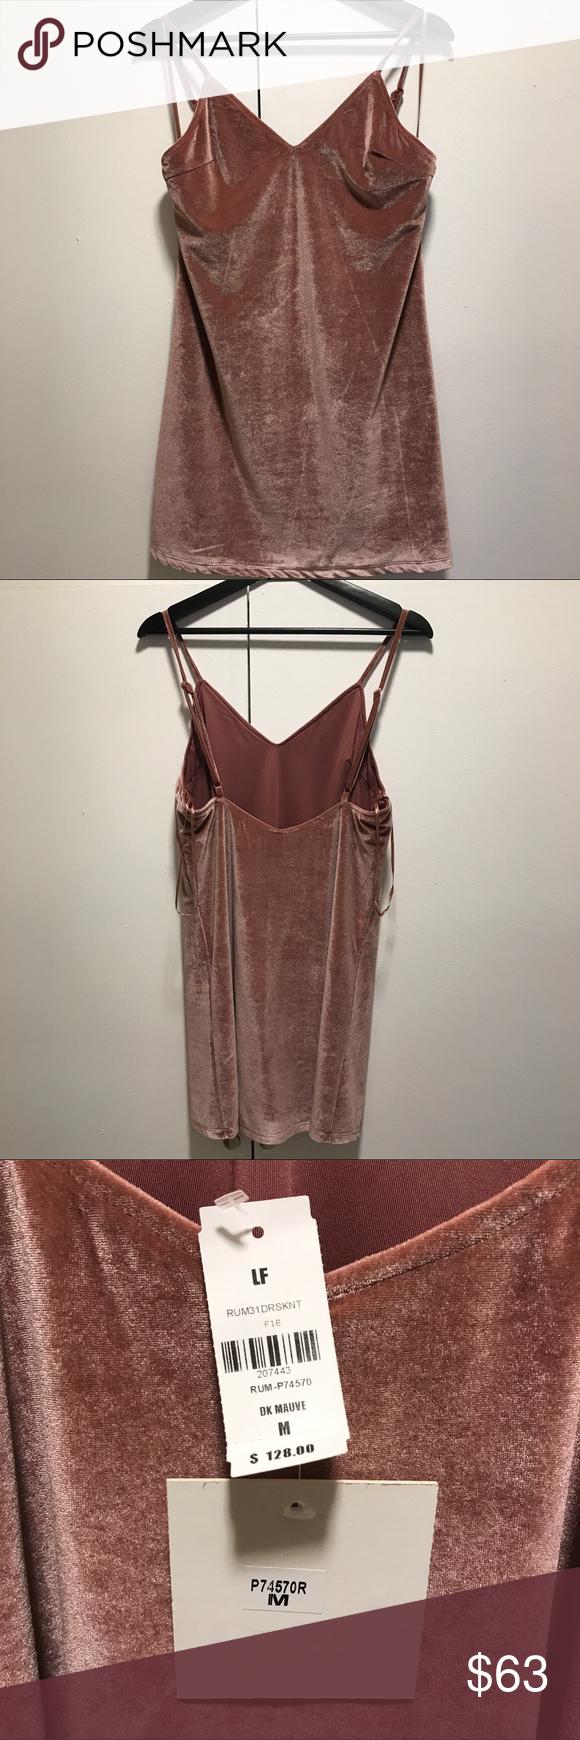 LF Stores Pink Velvet Dress Never worn. Size medium. LF